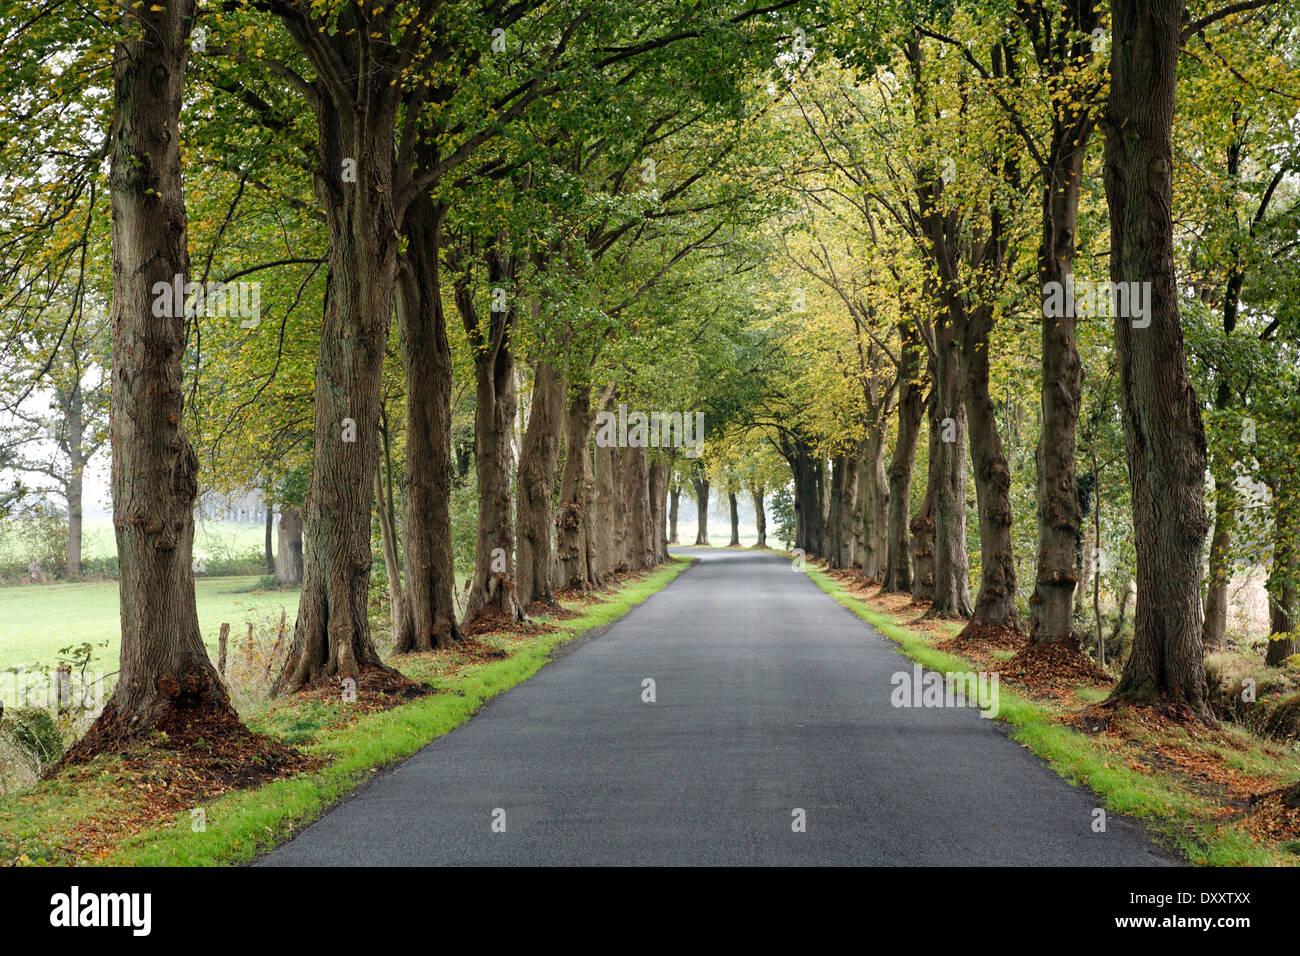 Germany, Lower Saxony, tree-lined avenue, road, Deutschland, Niedersachsen, Baumallee, Strasse - Stock Image